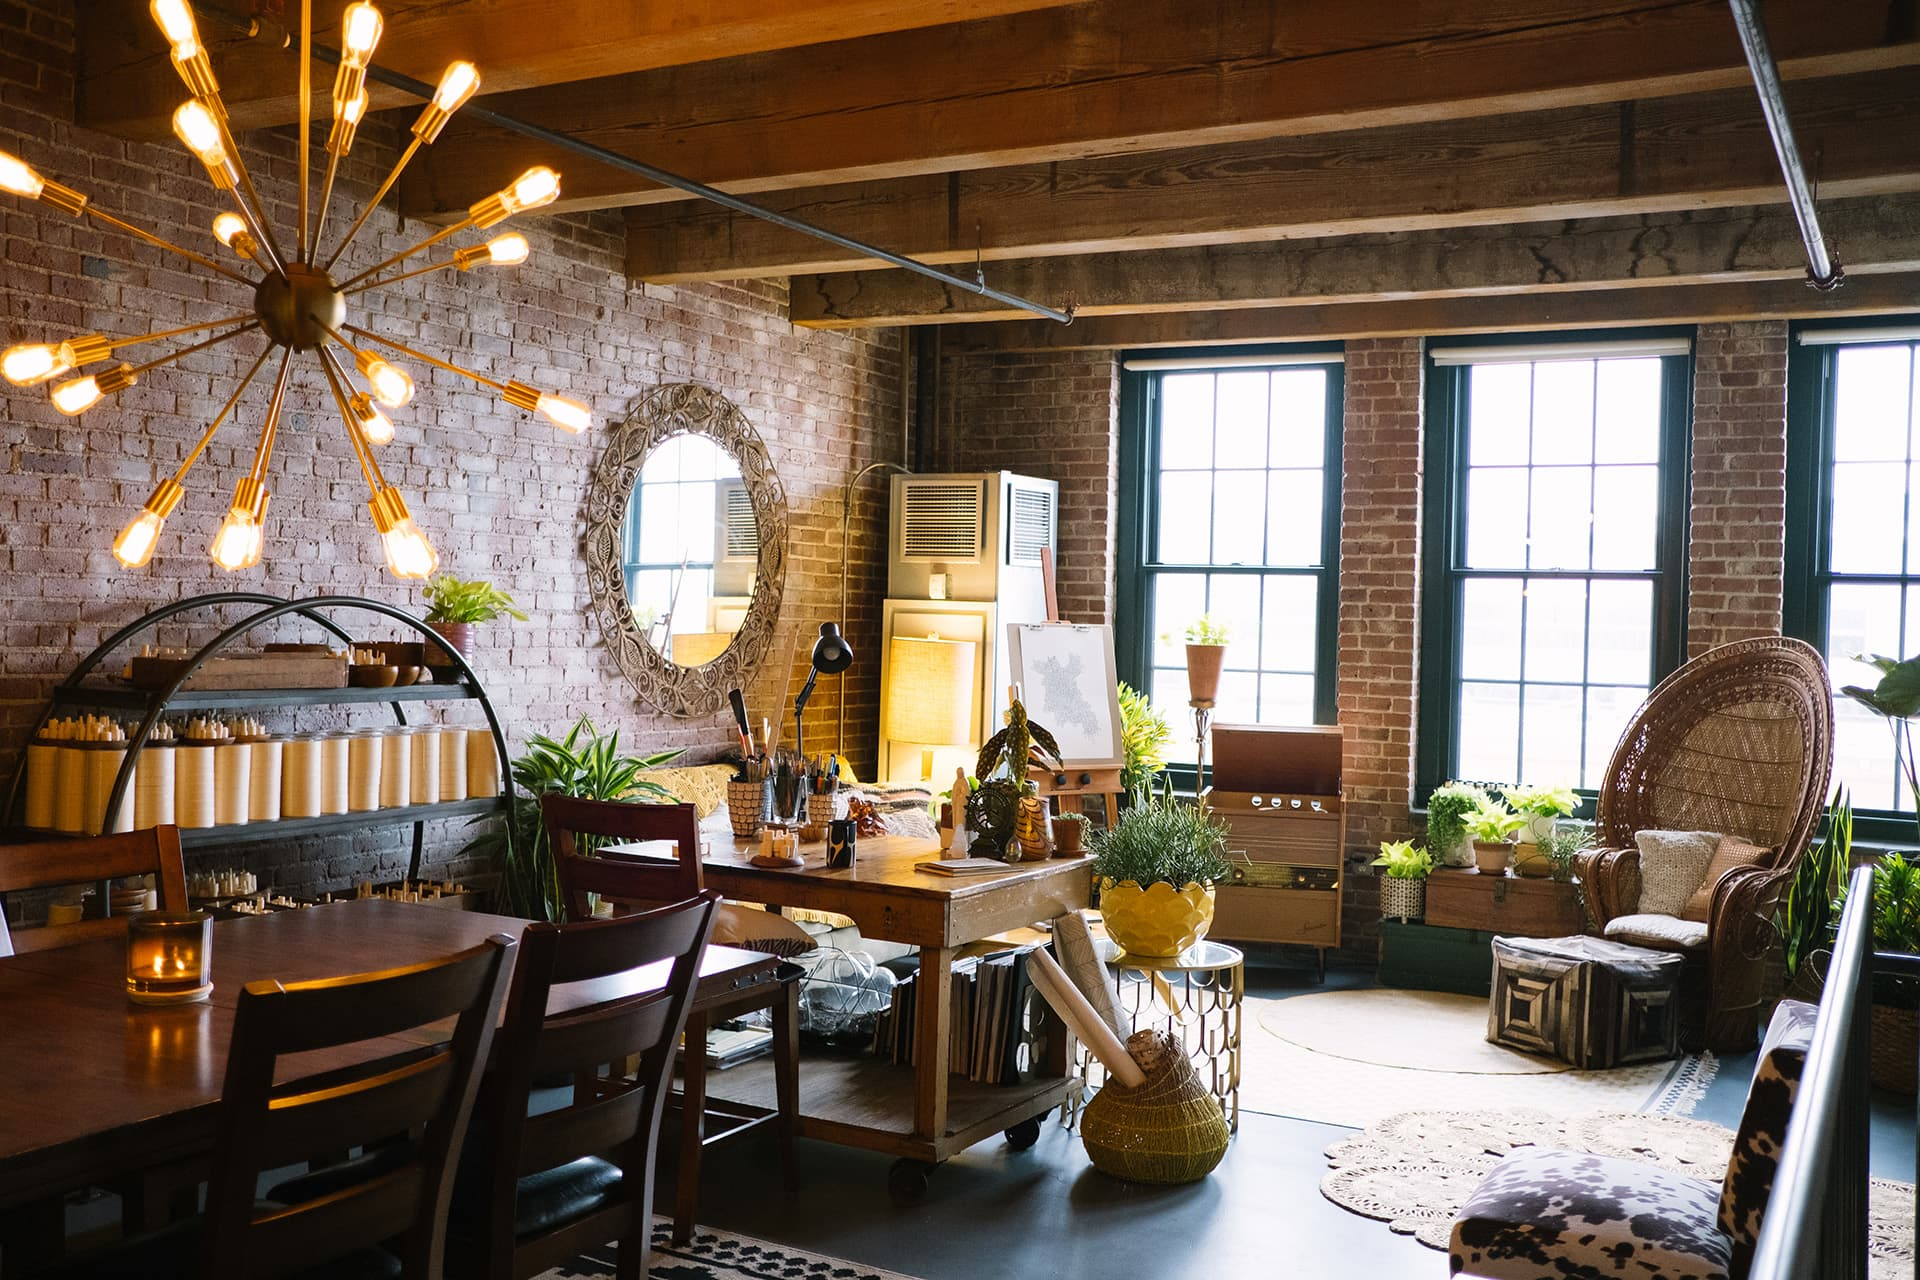 This Artist's Brick Boston Loft Is a Plant-Filled Boho Industrial Dream